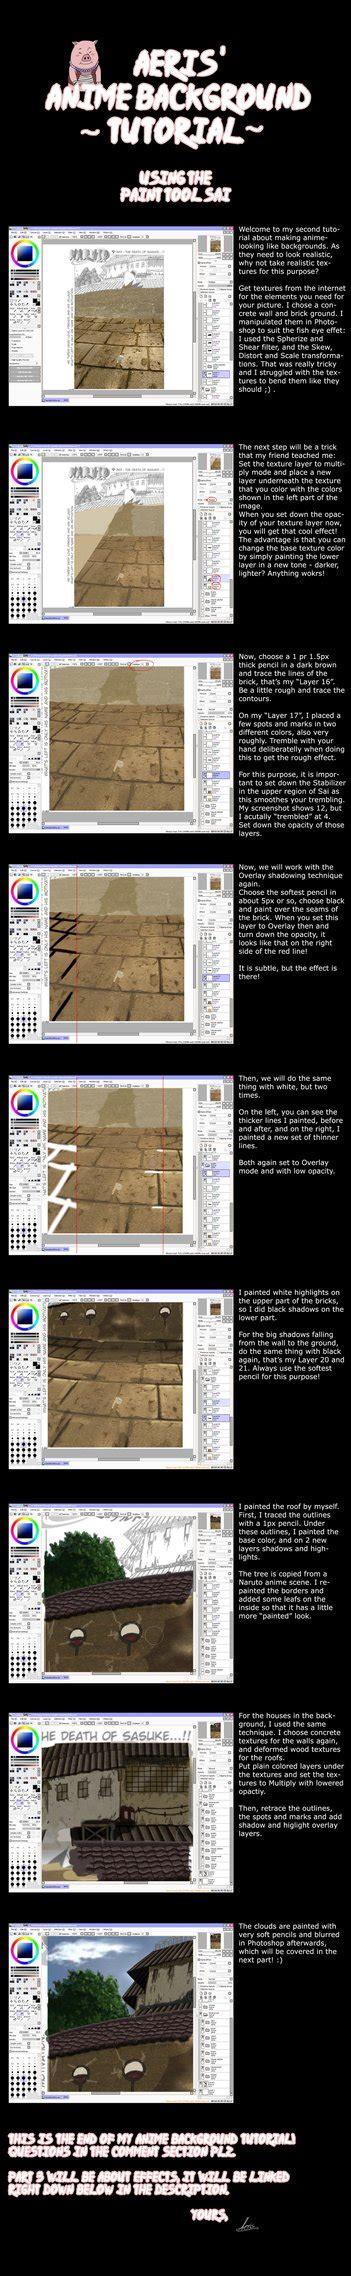 paint tool sai tutorial background sai anime background tutorial by aeris85 on deviantart